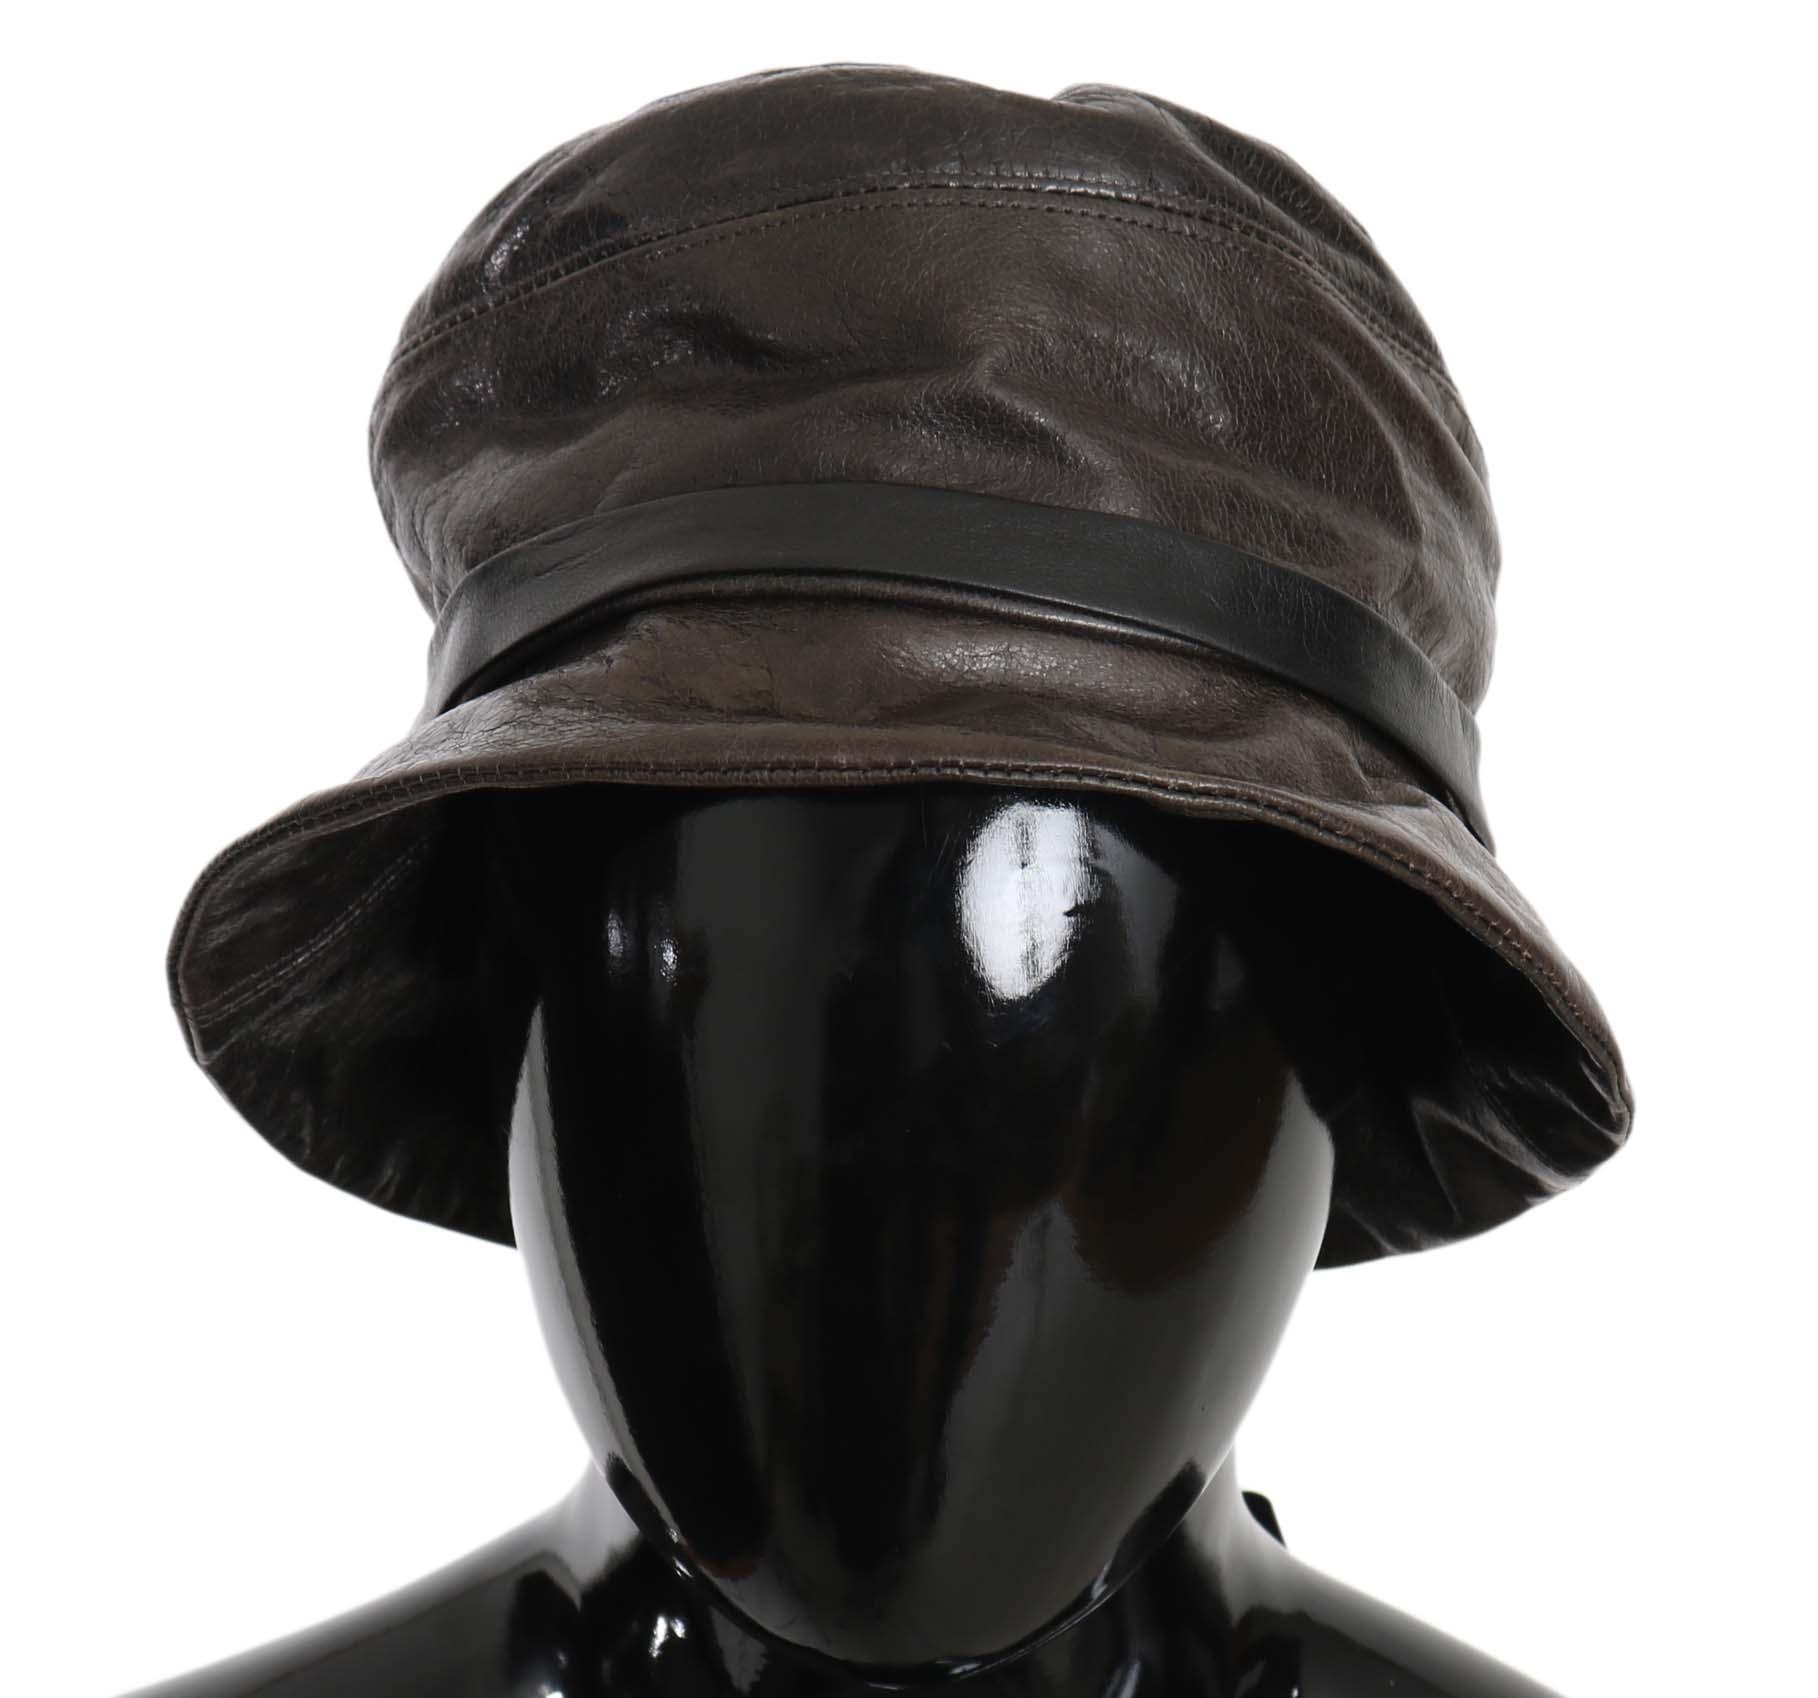 Dolce & Gabbana Women's Hat Brown HAT70217 - 56 cm XS